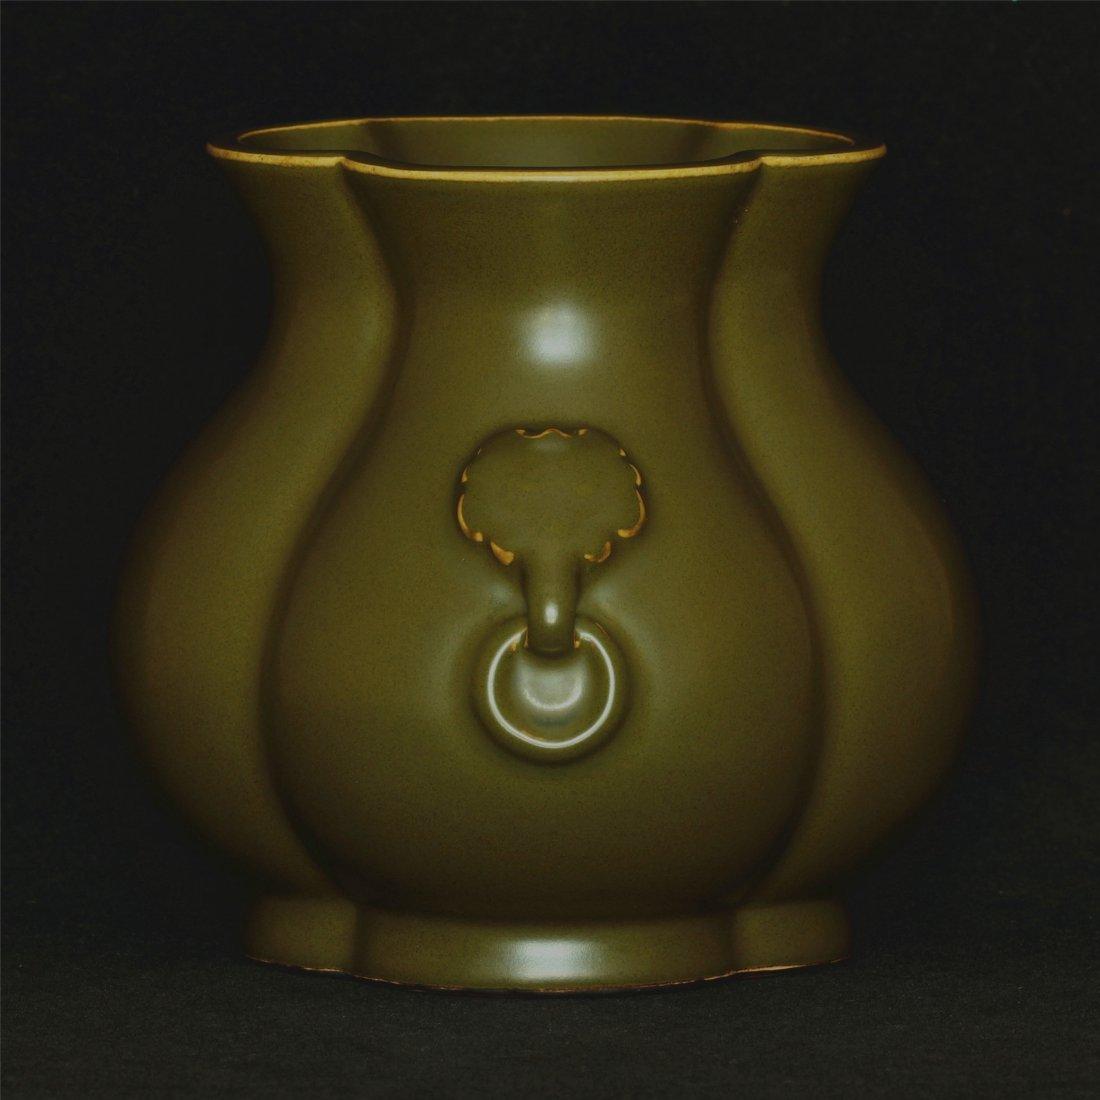 Tea glaze porcelain jar of Qing Dynasty QianLong mark.